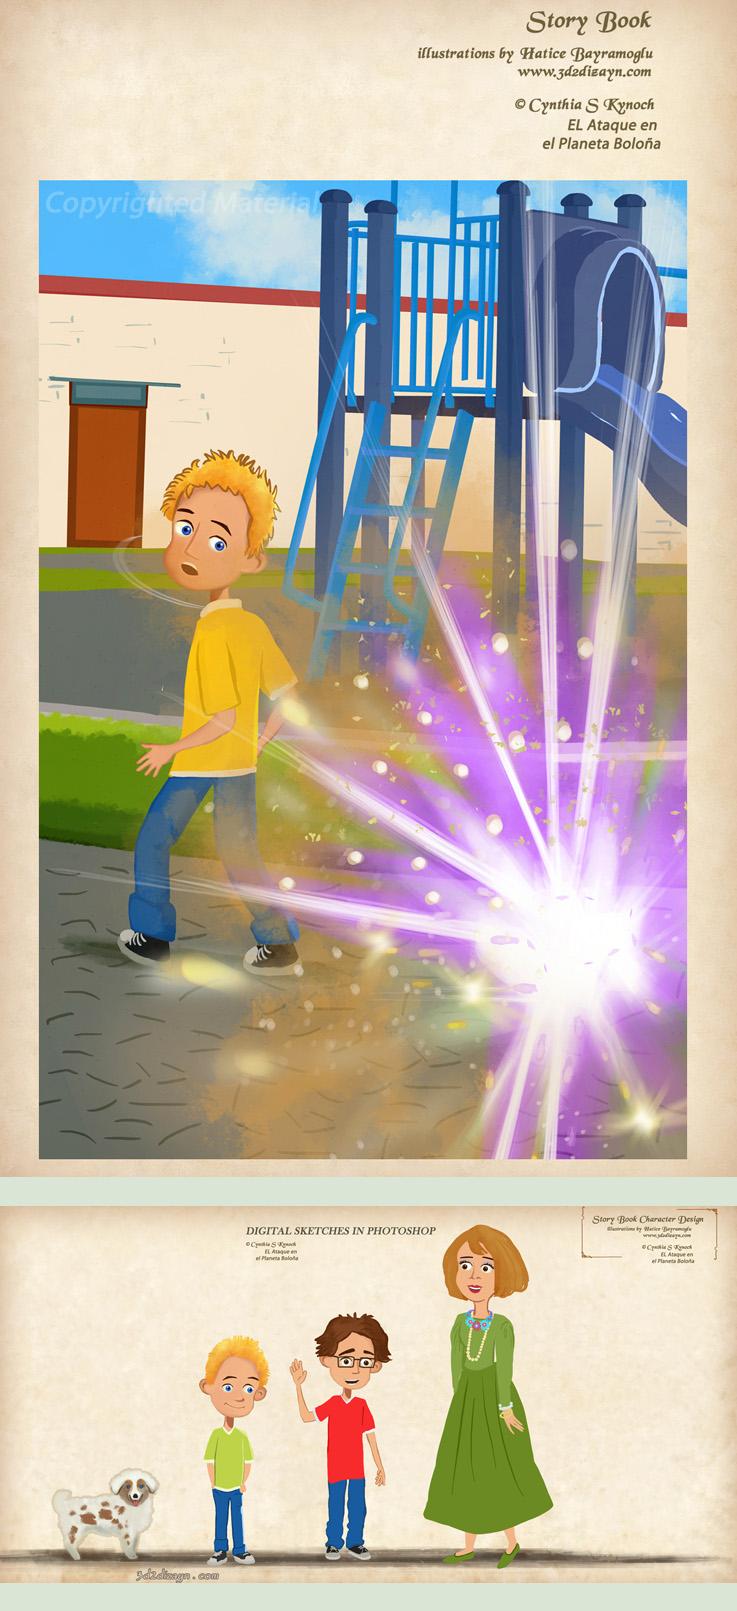 children's book illustrator by eydii